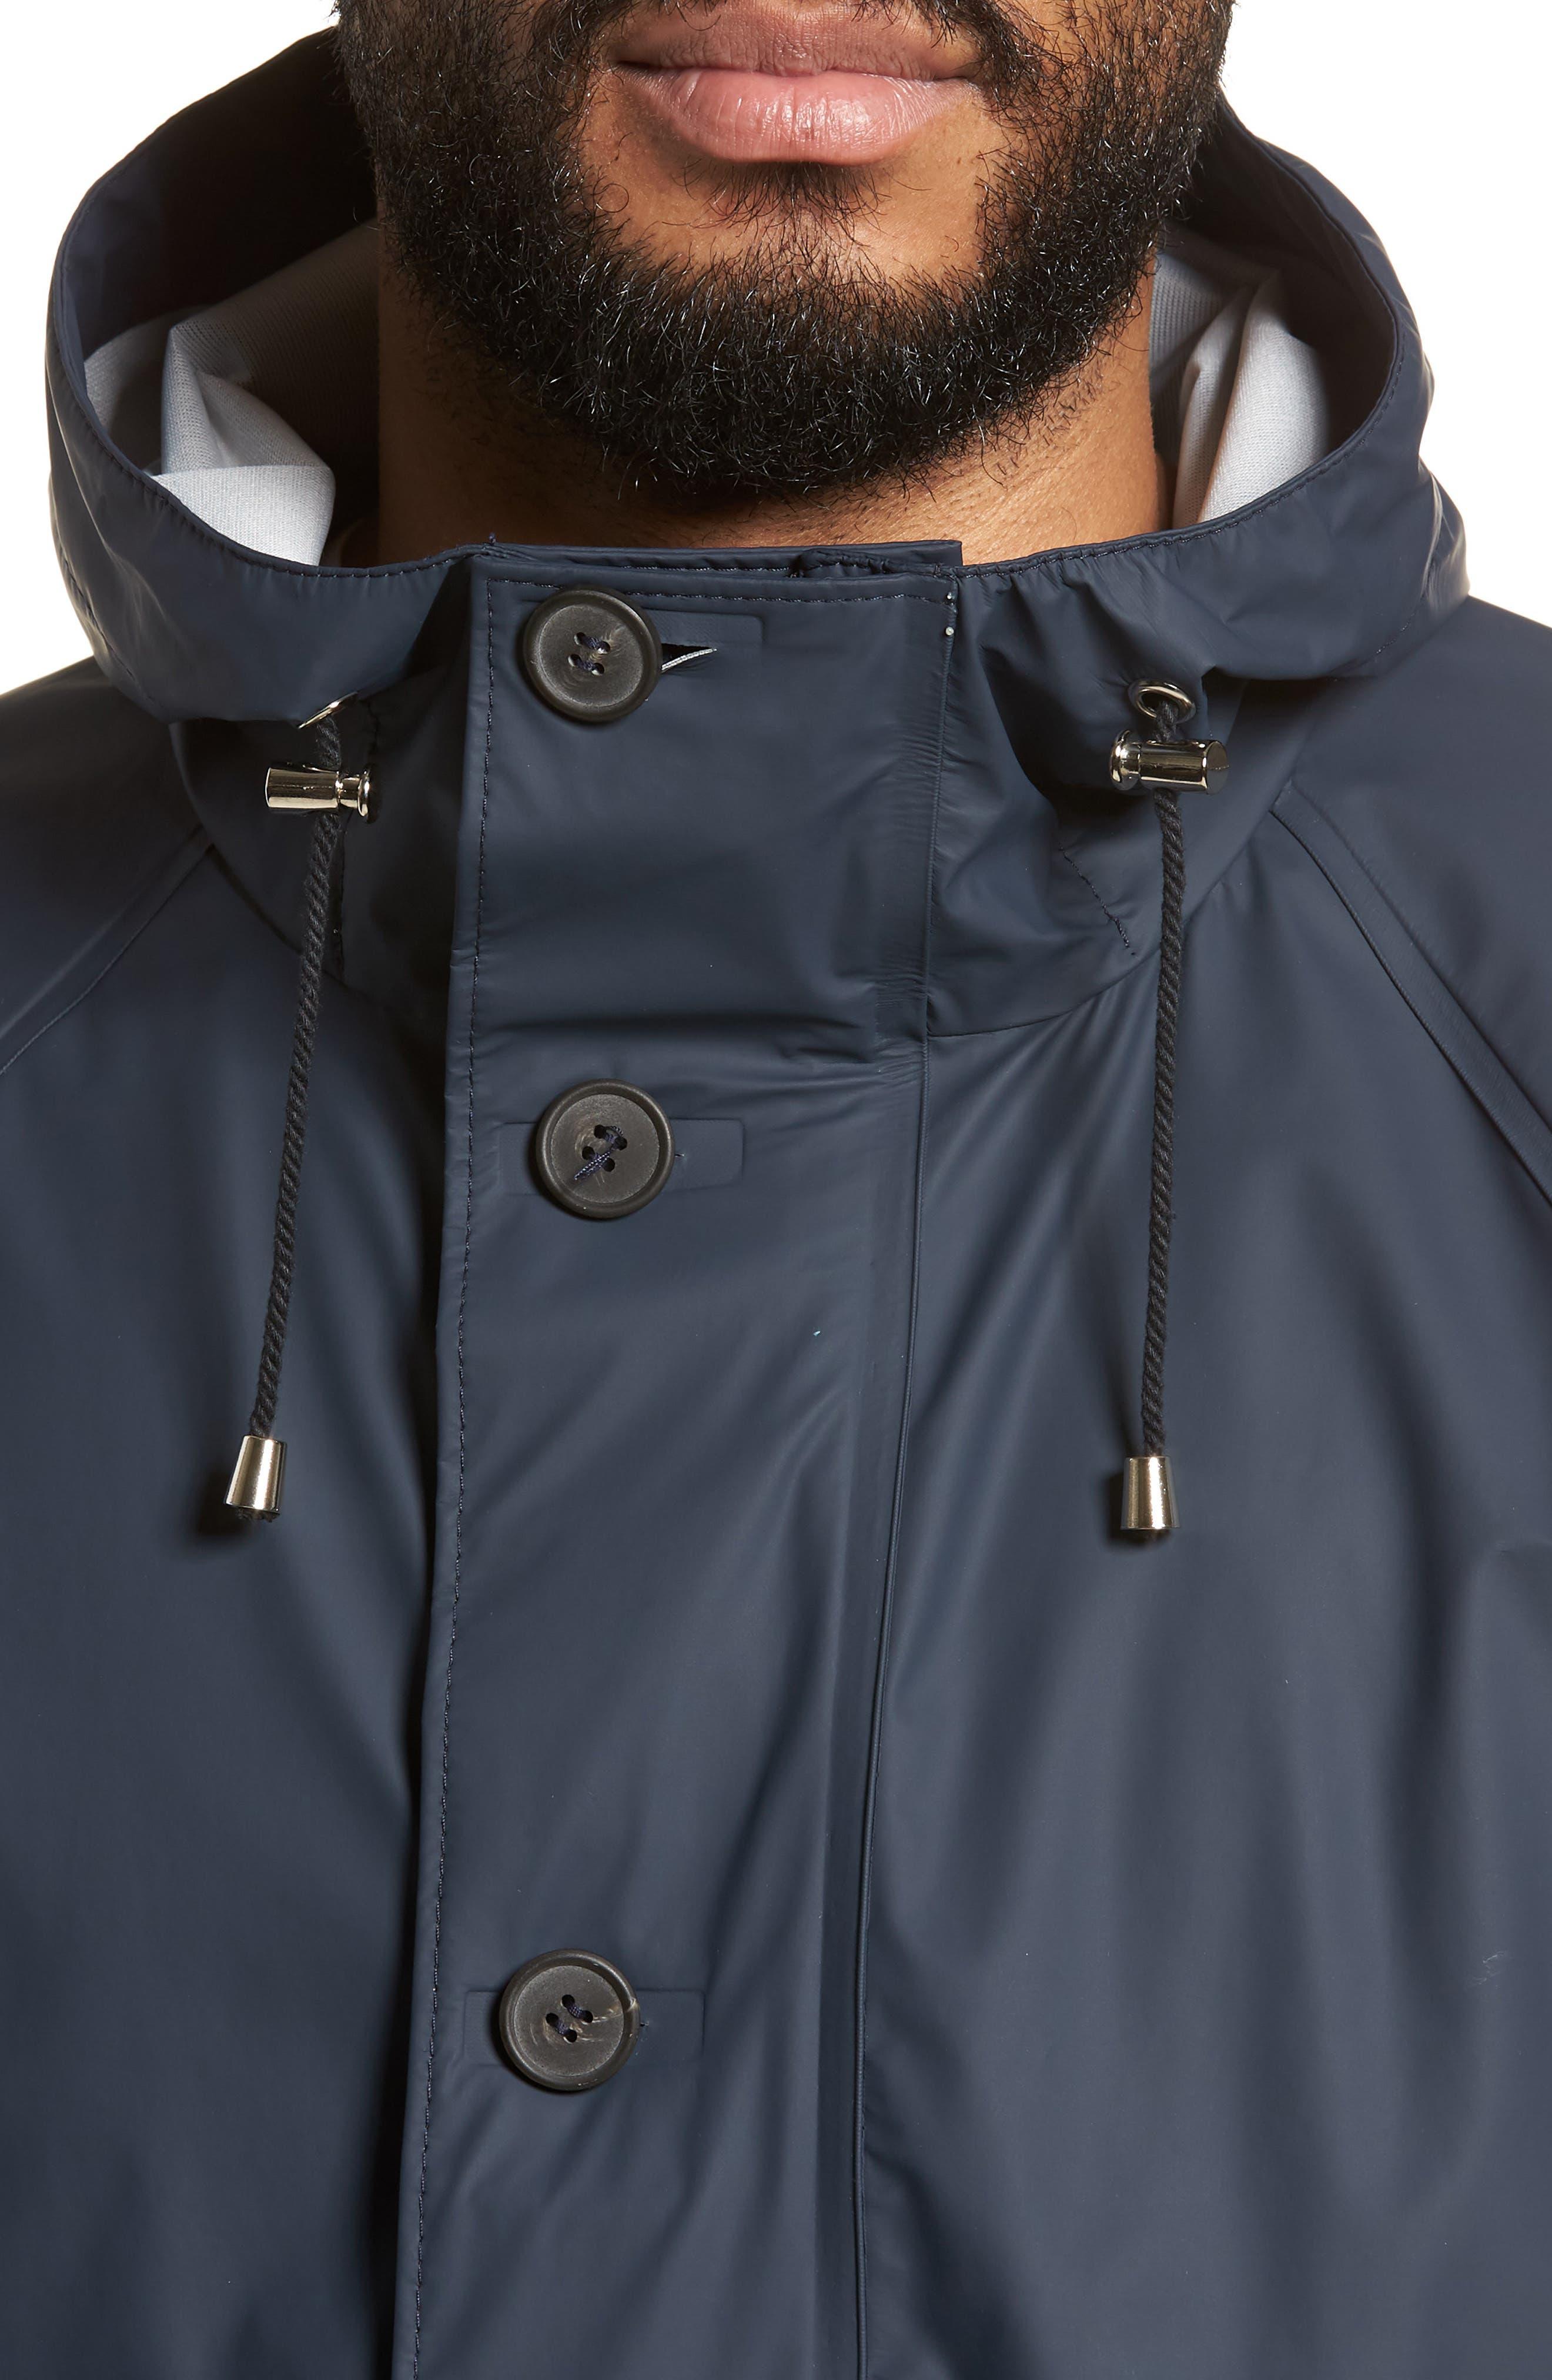 Stenhamra Classic Fit Jacket,                             Alternate thumbnail 4, color,                             NAVY